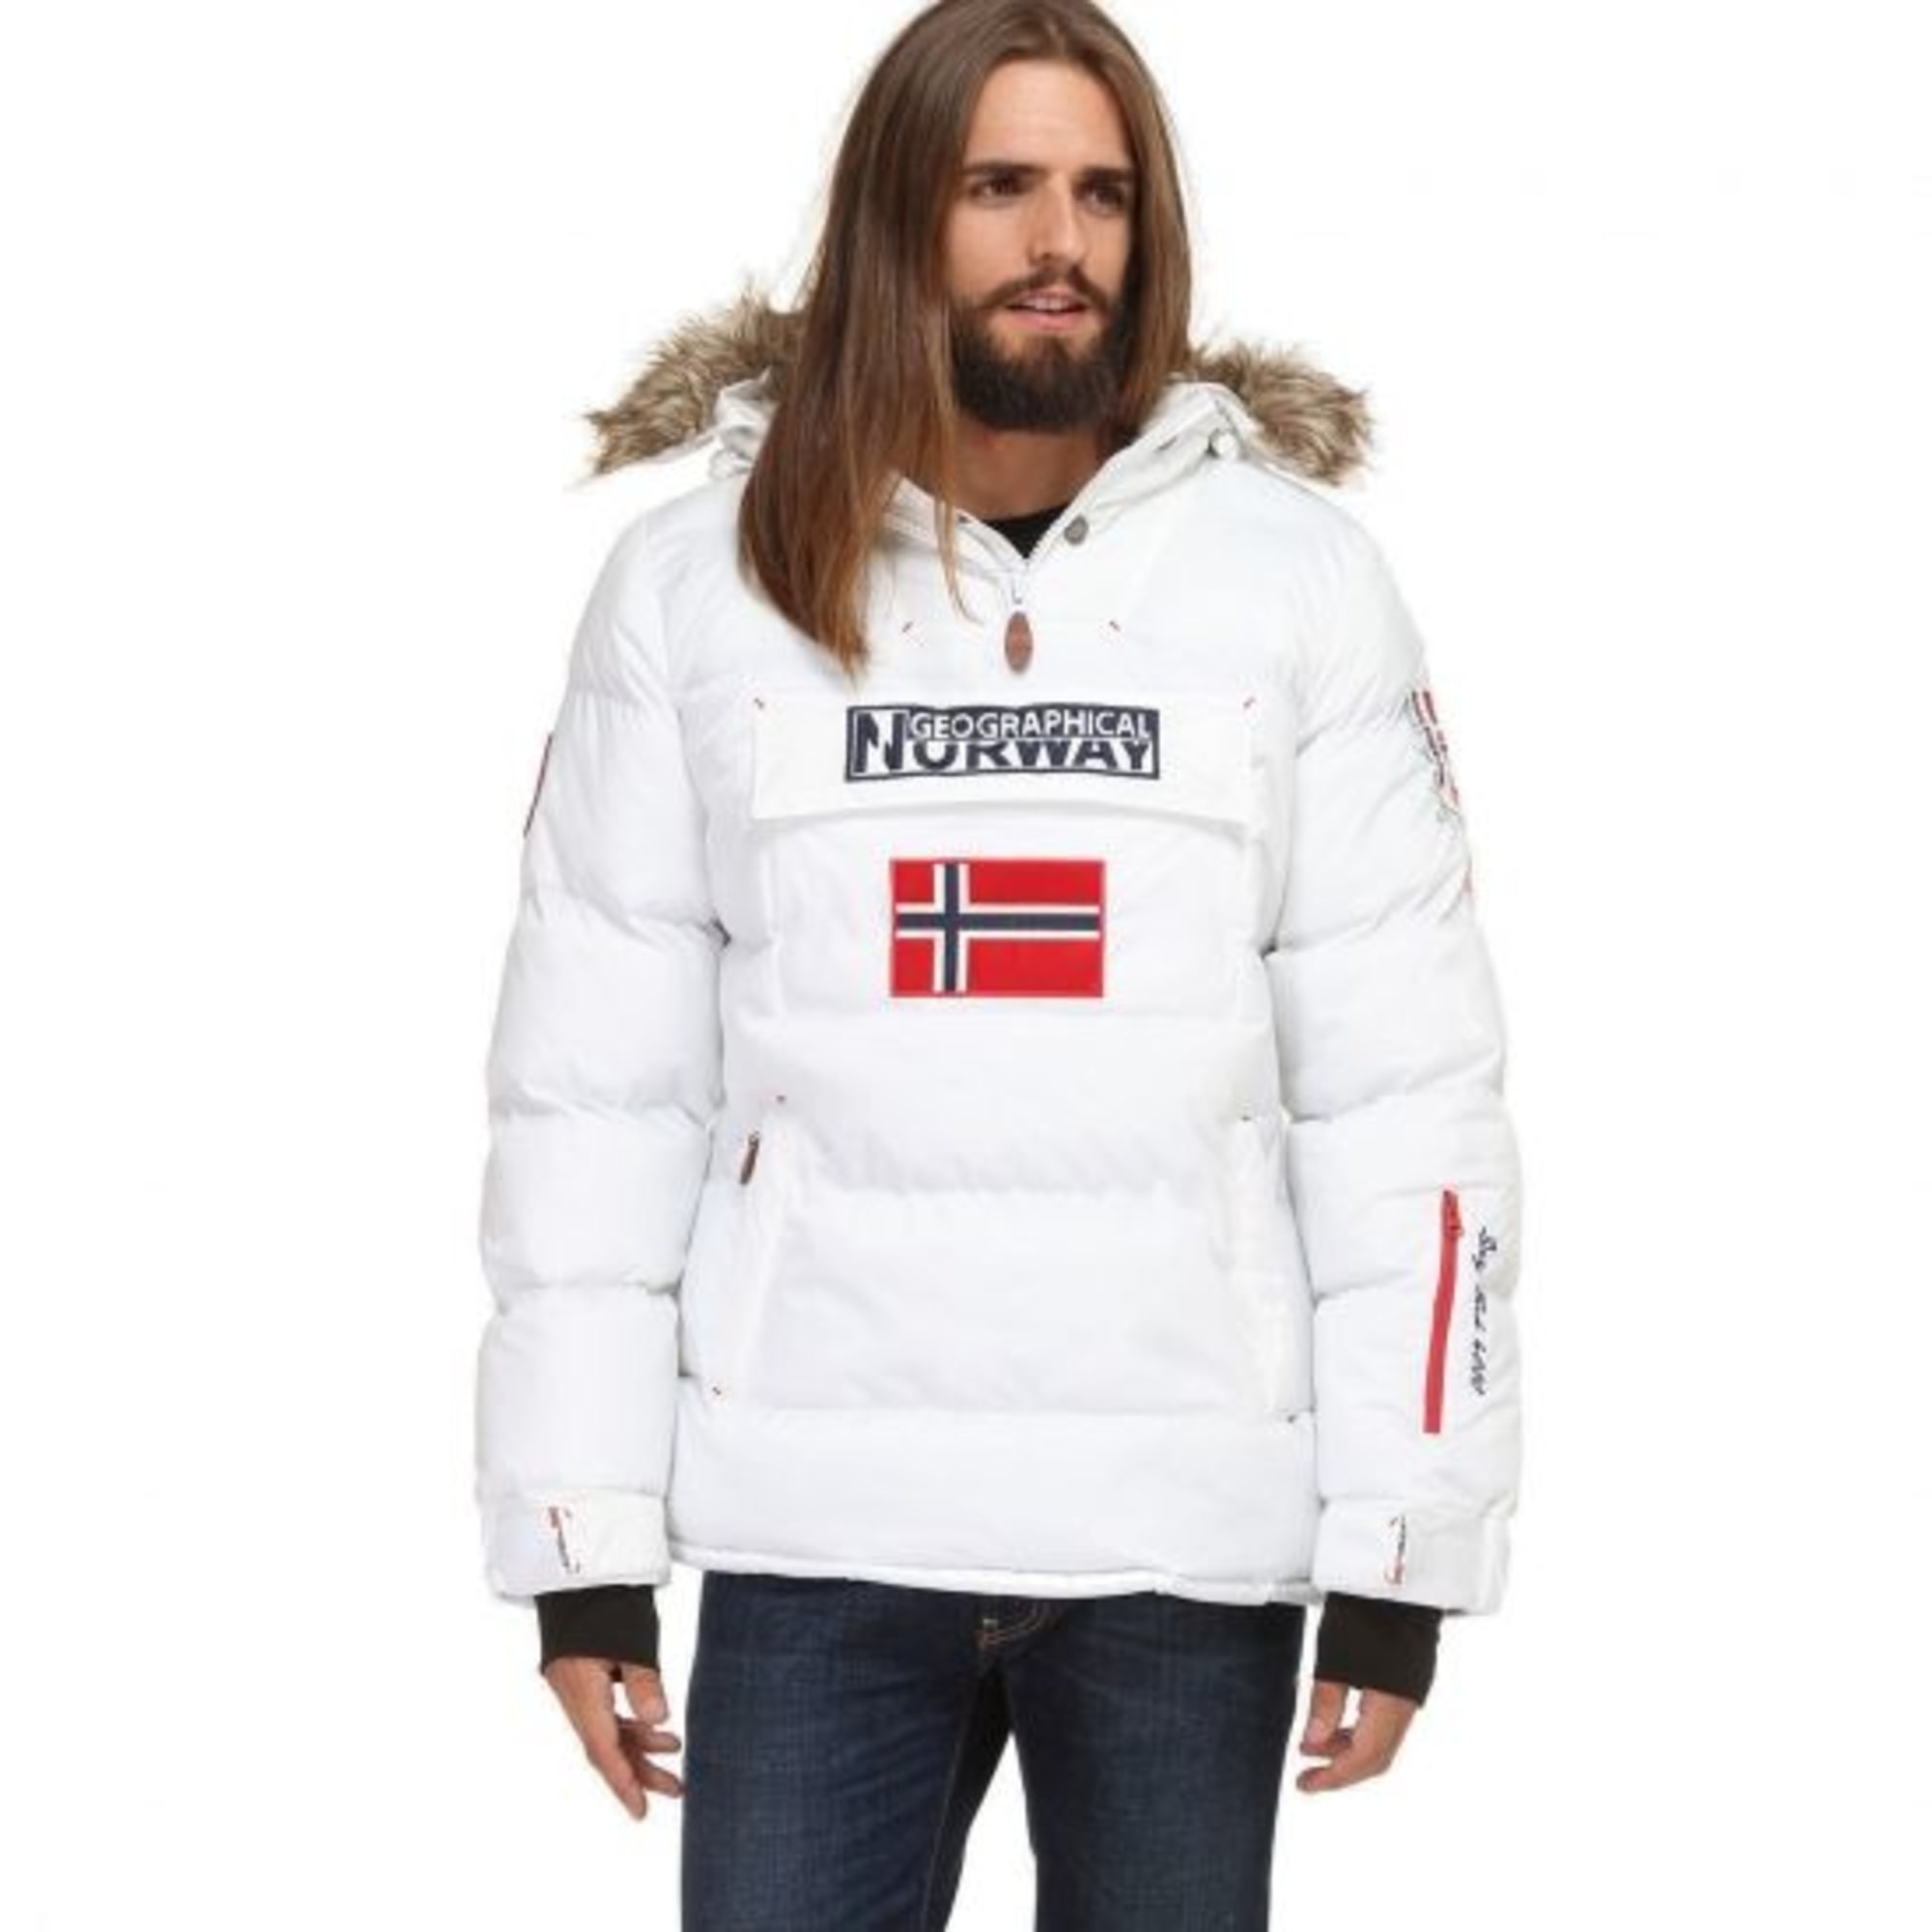 Doudoune Geographical Norway Bolide Achat Vente doudoune